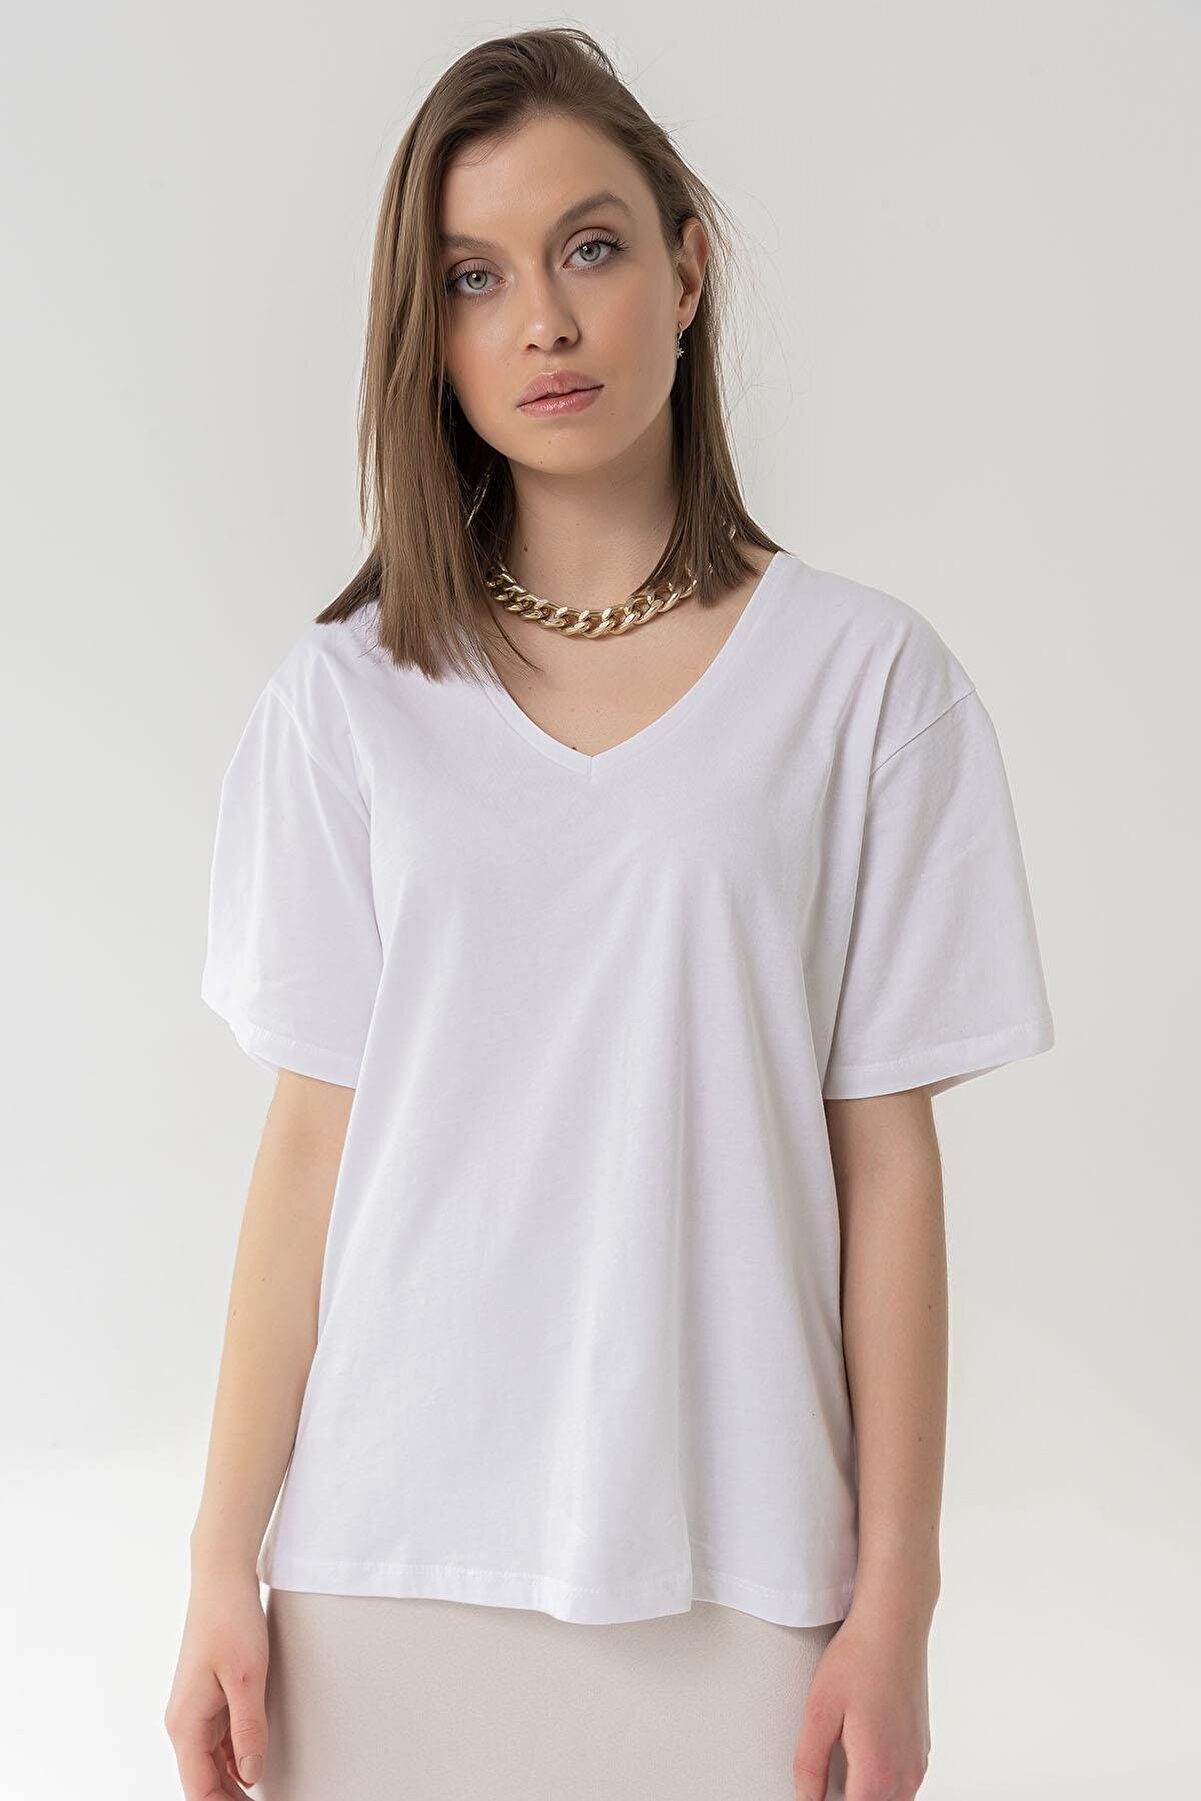 Bases Kadın Beyaz Pamuklu V Yaka Boyfriend Oversize Örme T-Shirt